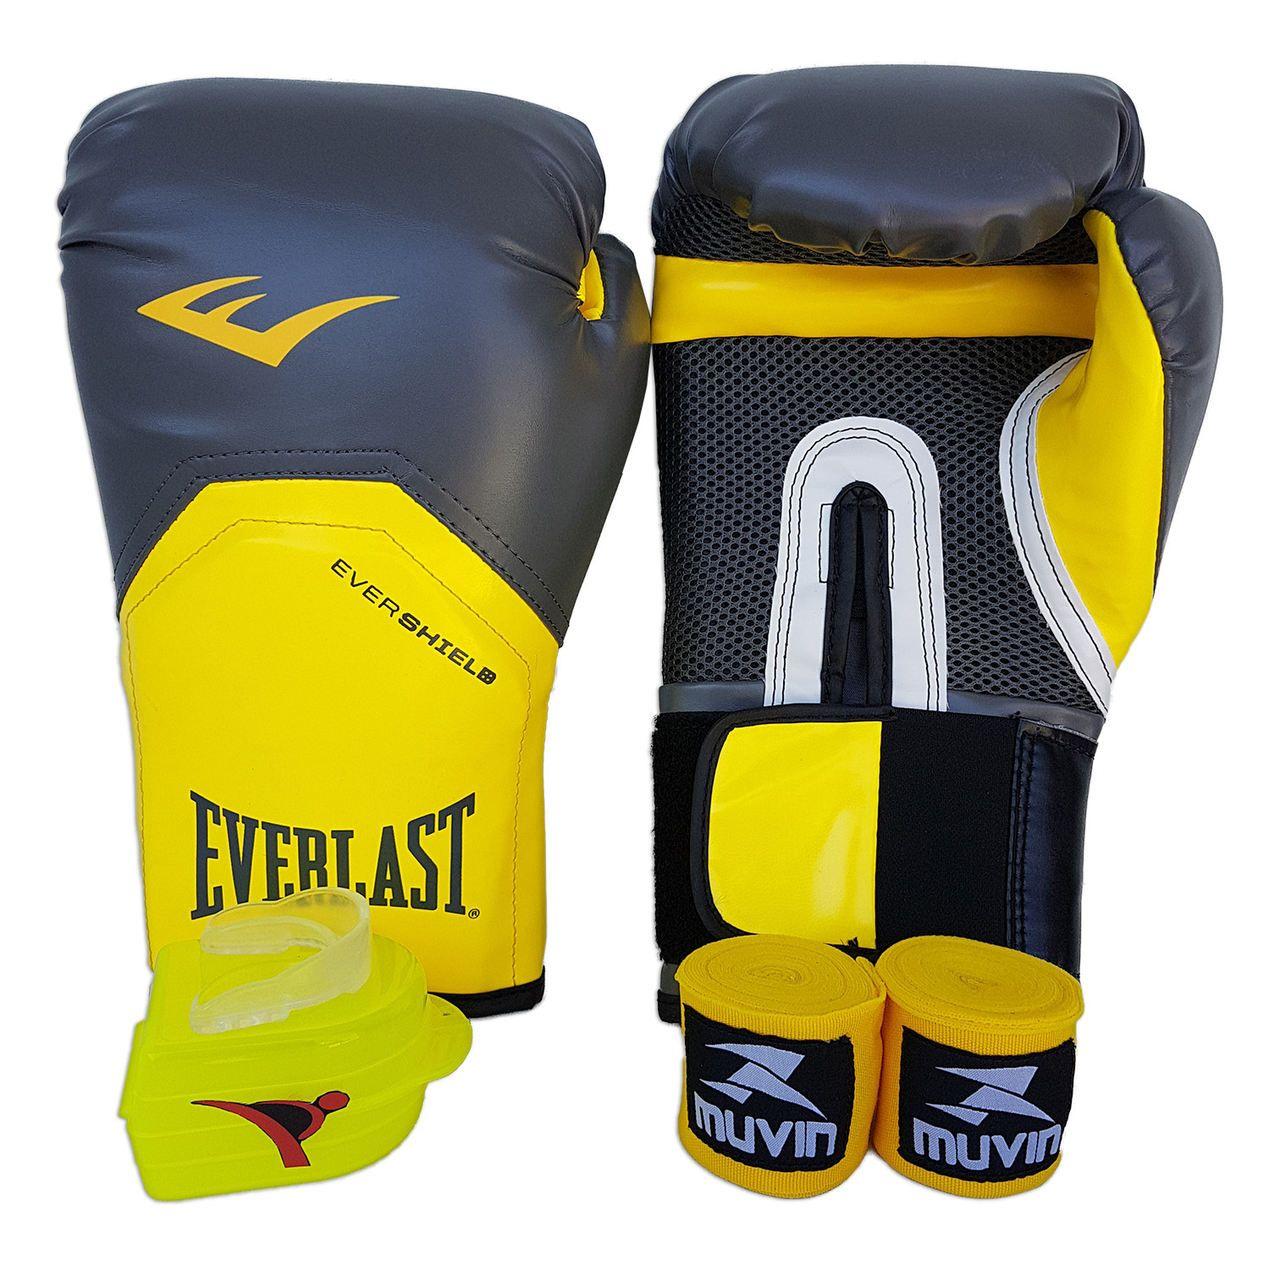 Kit de Boxe / Muay Thai 14oz - Cinza com Amarelo - Pro Style - Everlast  - PRALUTA SHOP